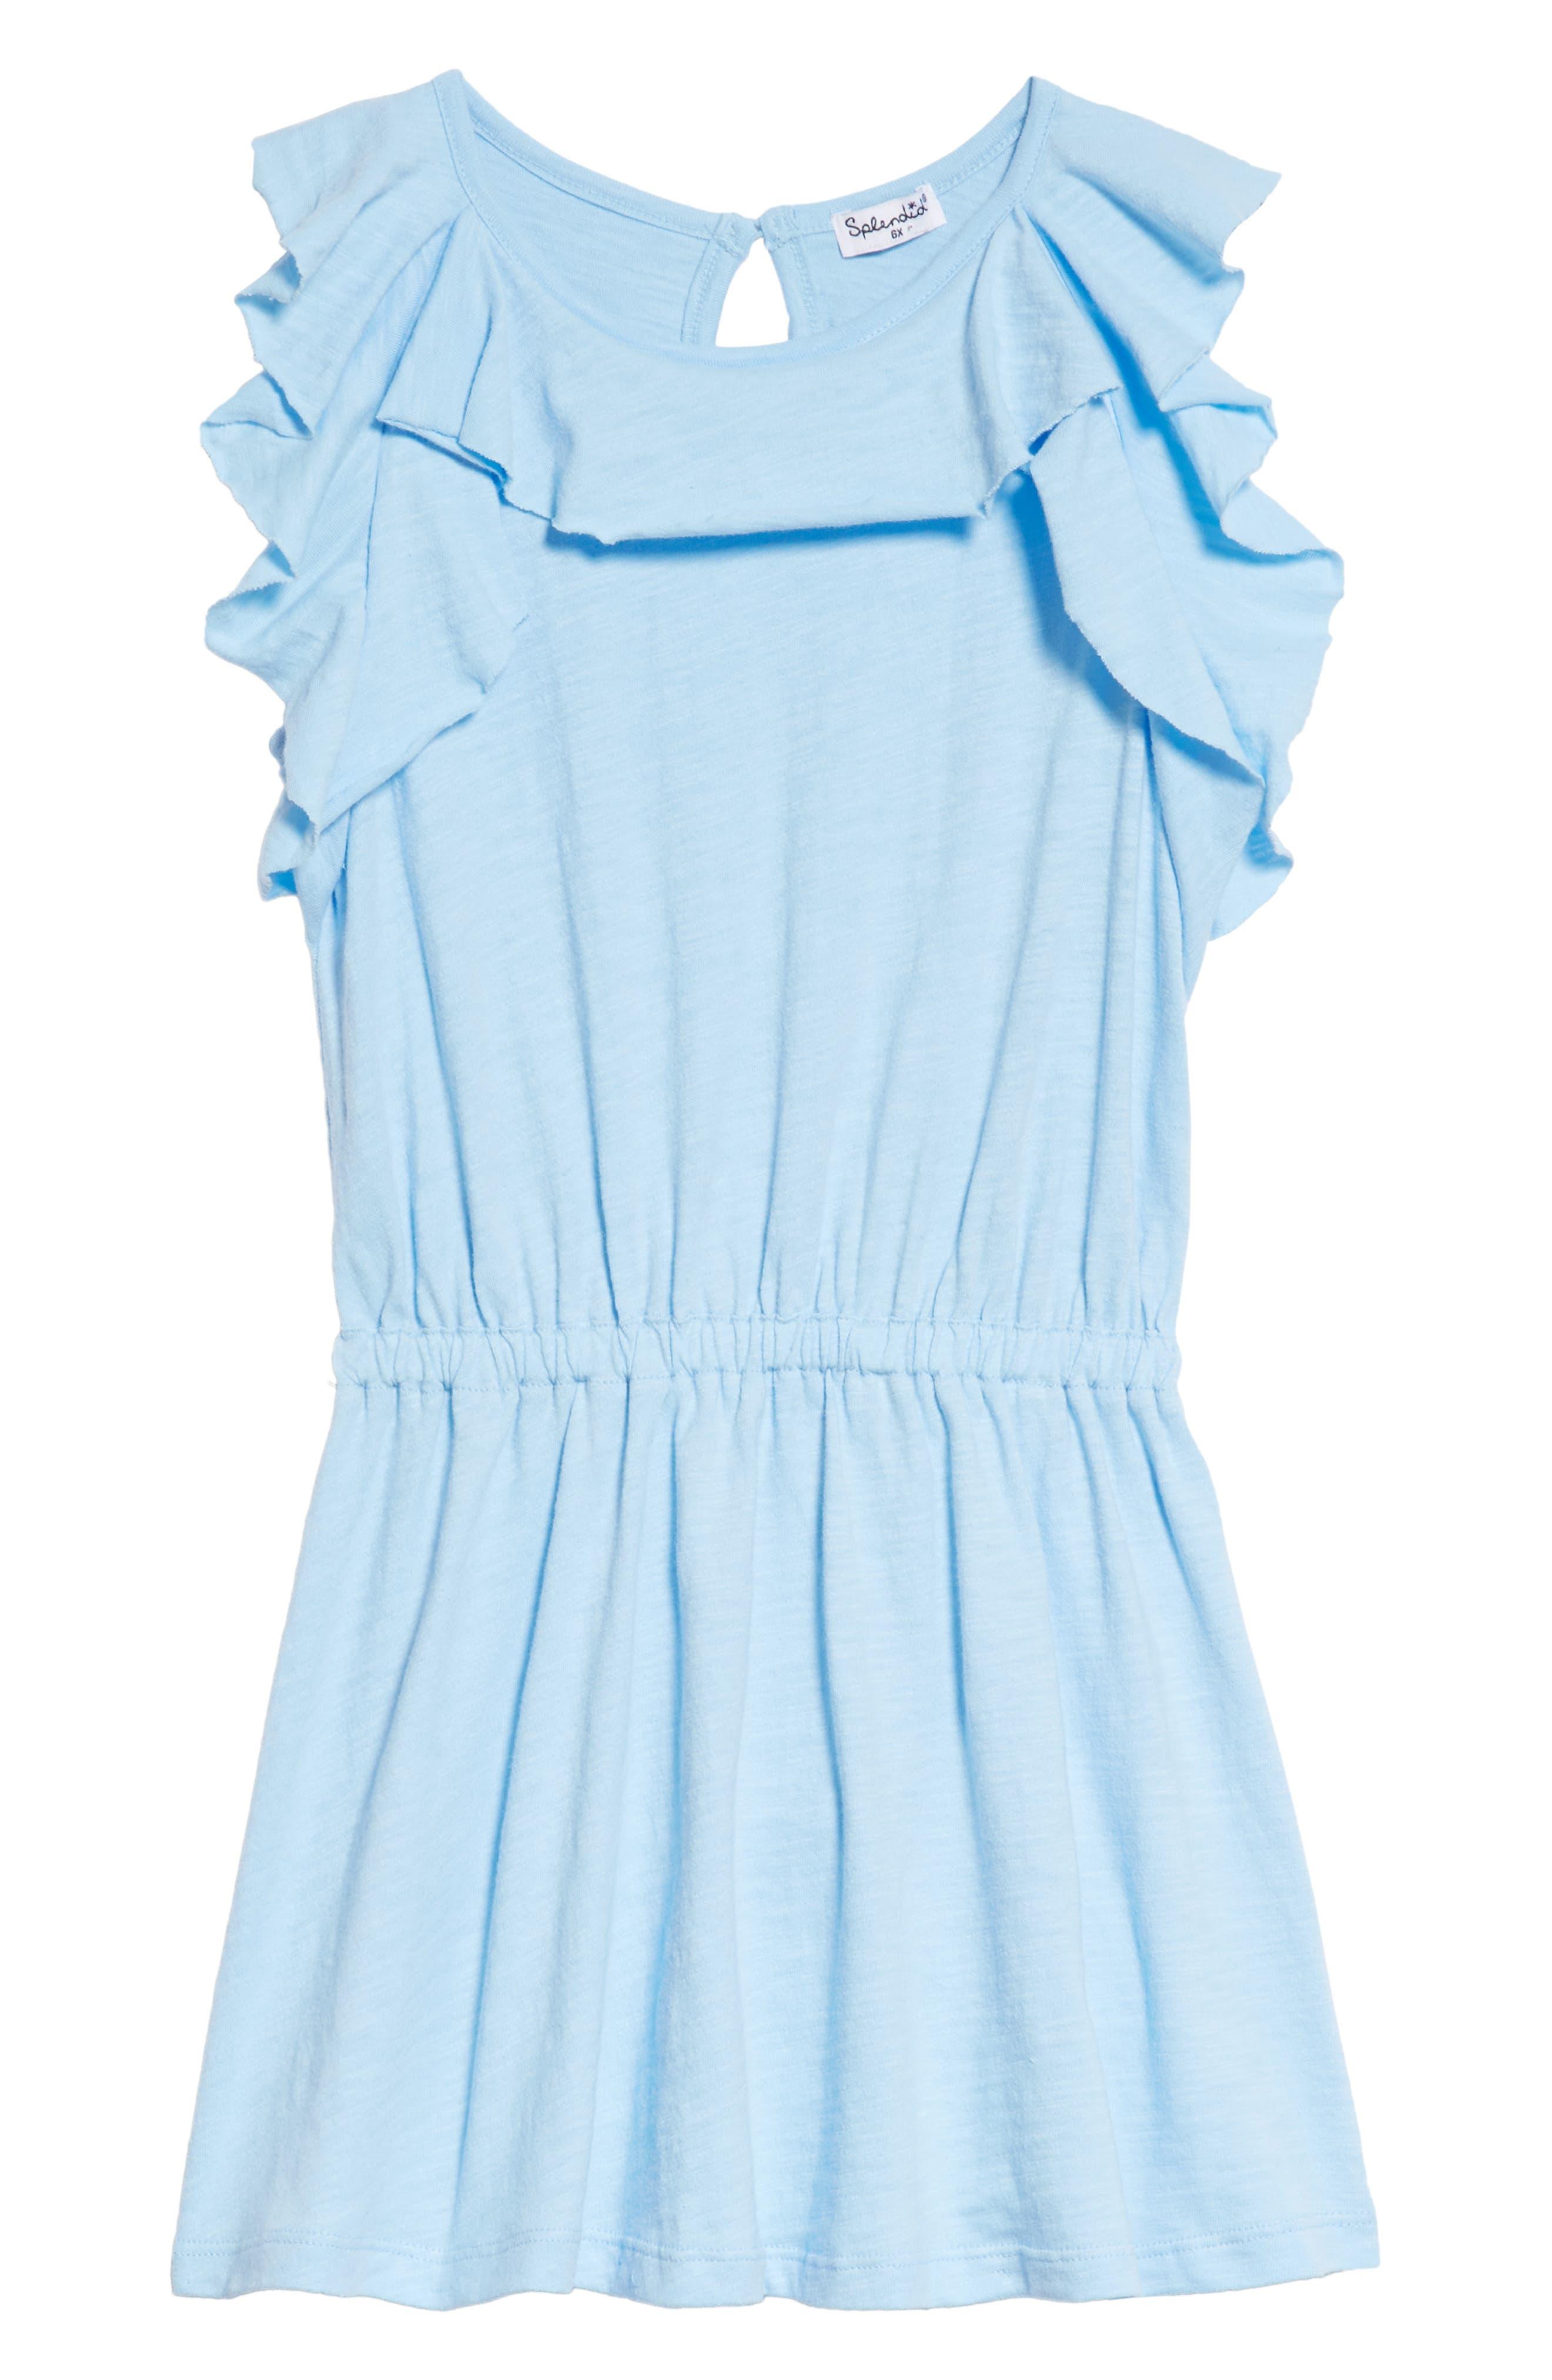 Main Image - Splendid Flounce Dress (Toddler Girls & Little Girls)